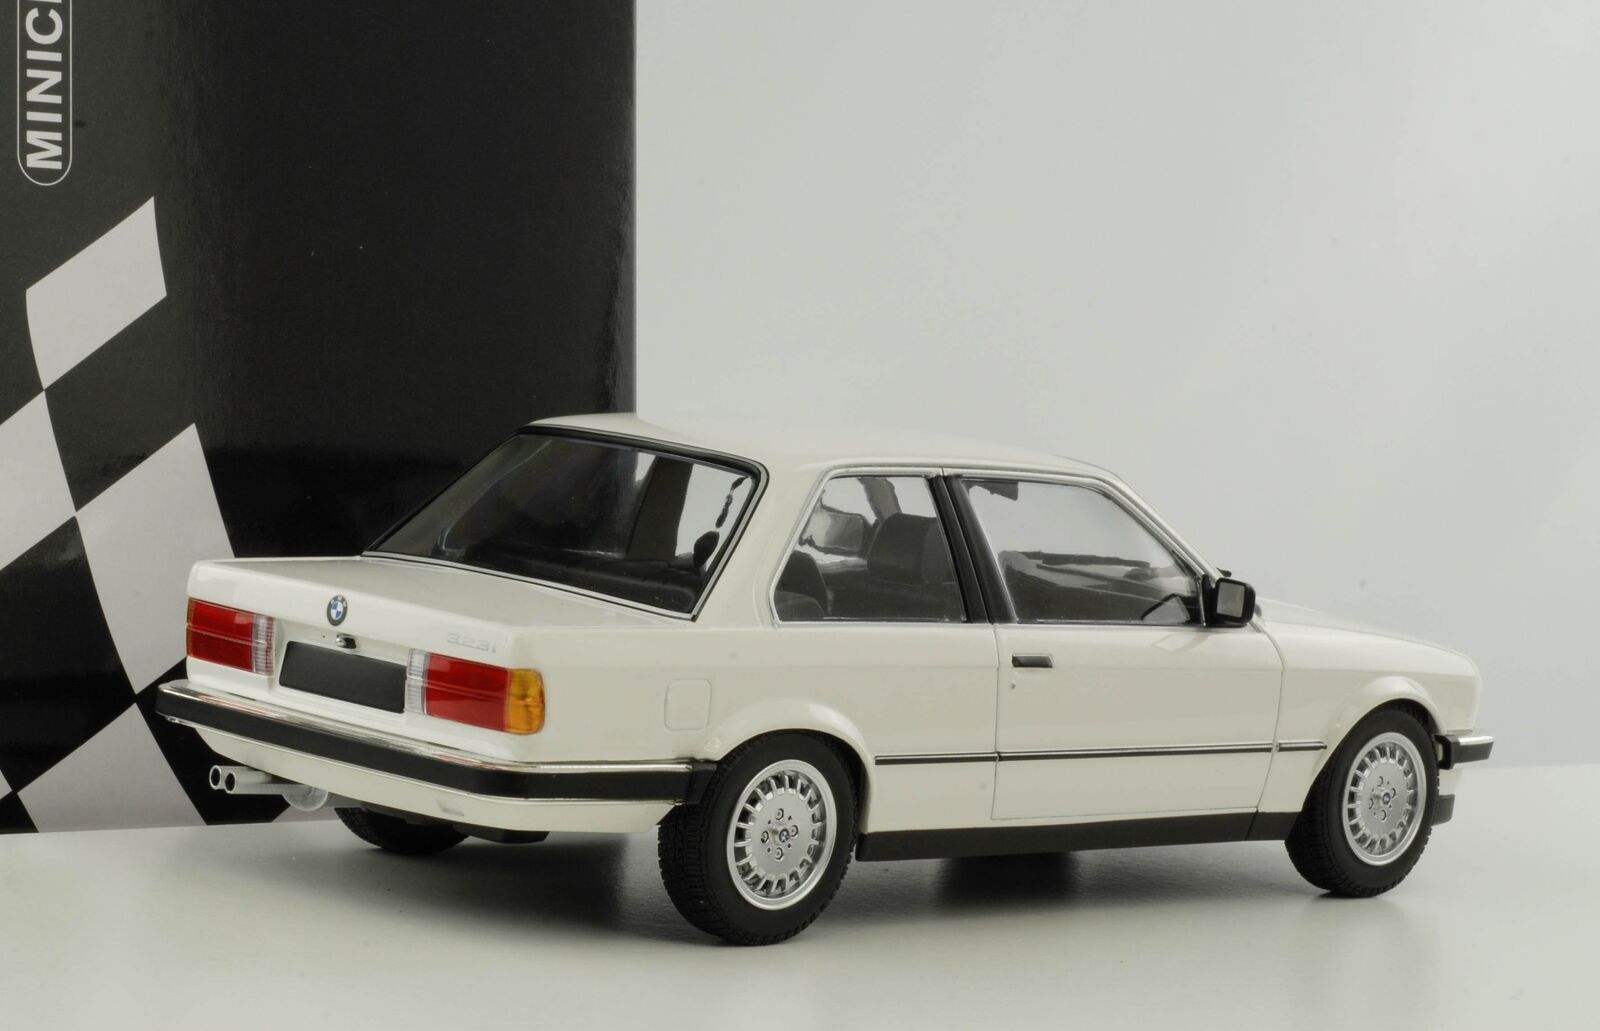 Bmw e30 1982 weiss modellauto angelegt haben 323i druckguss 1,18 minichamps neu